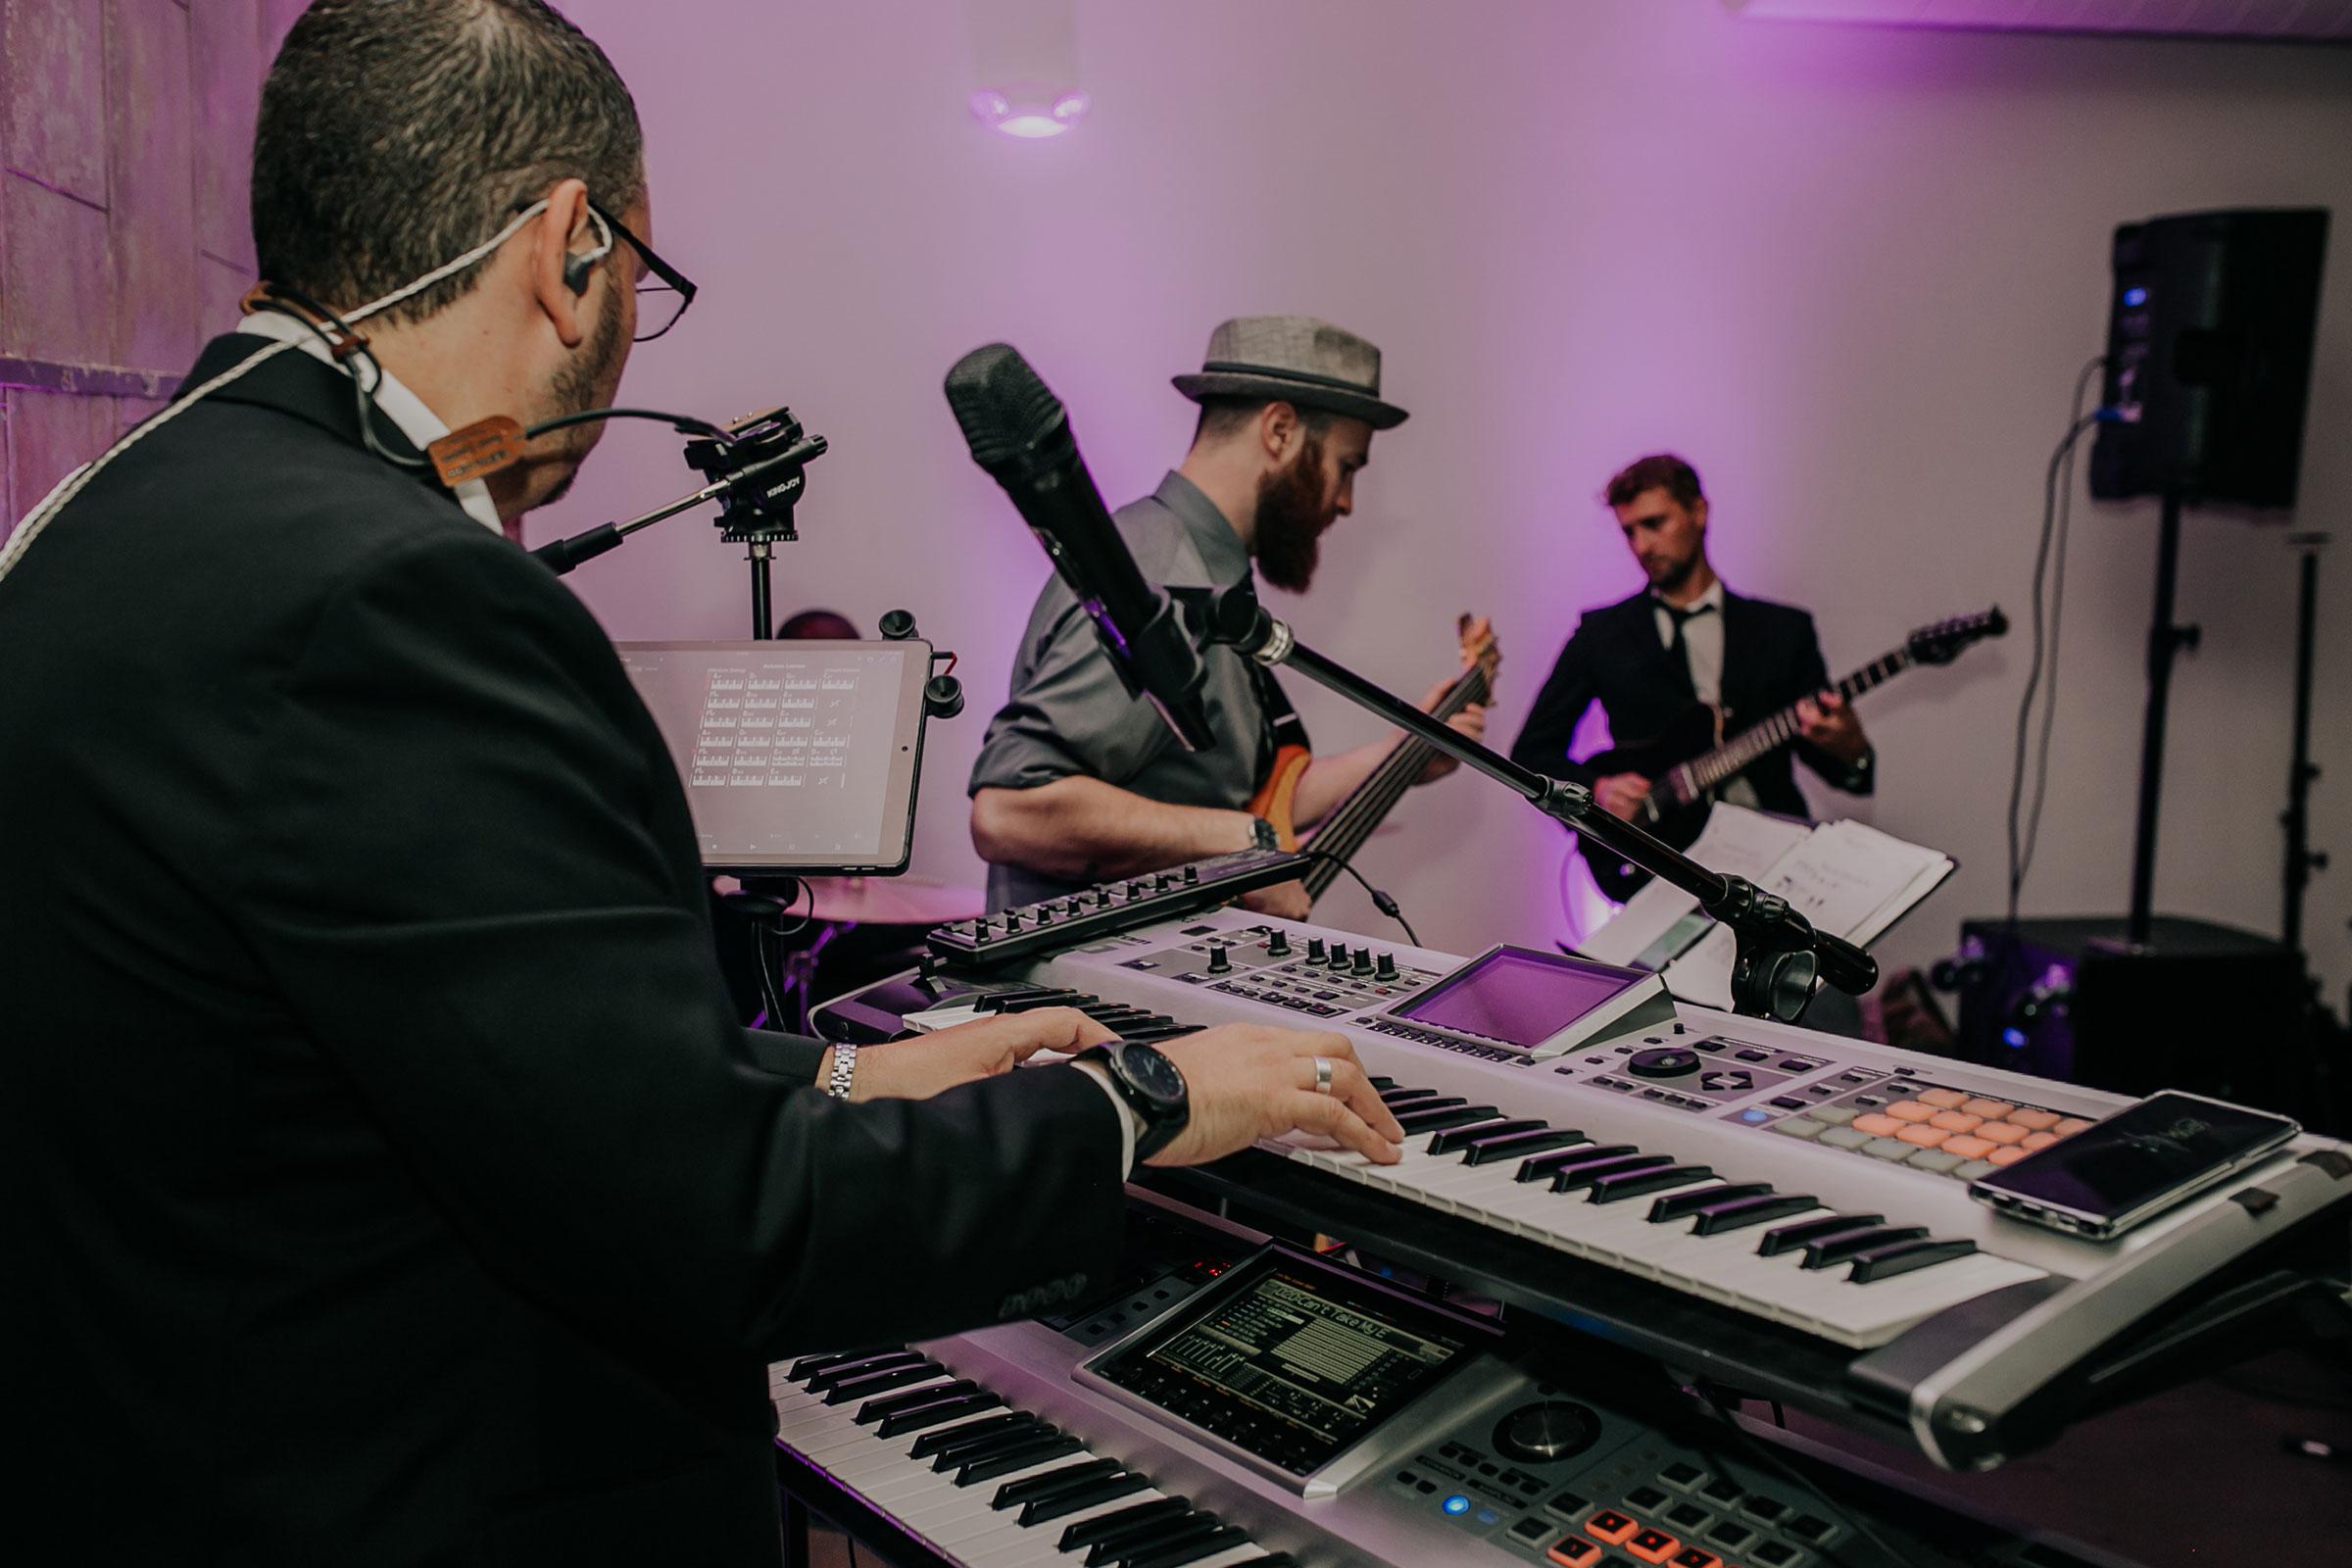 diamond-empire-band-playing-piano-founders-one-nine-omaha-nebraska-raelyn-ramey-photography.jpg